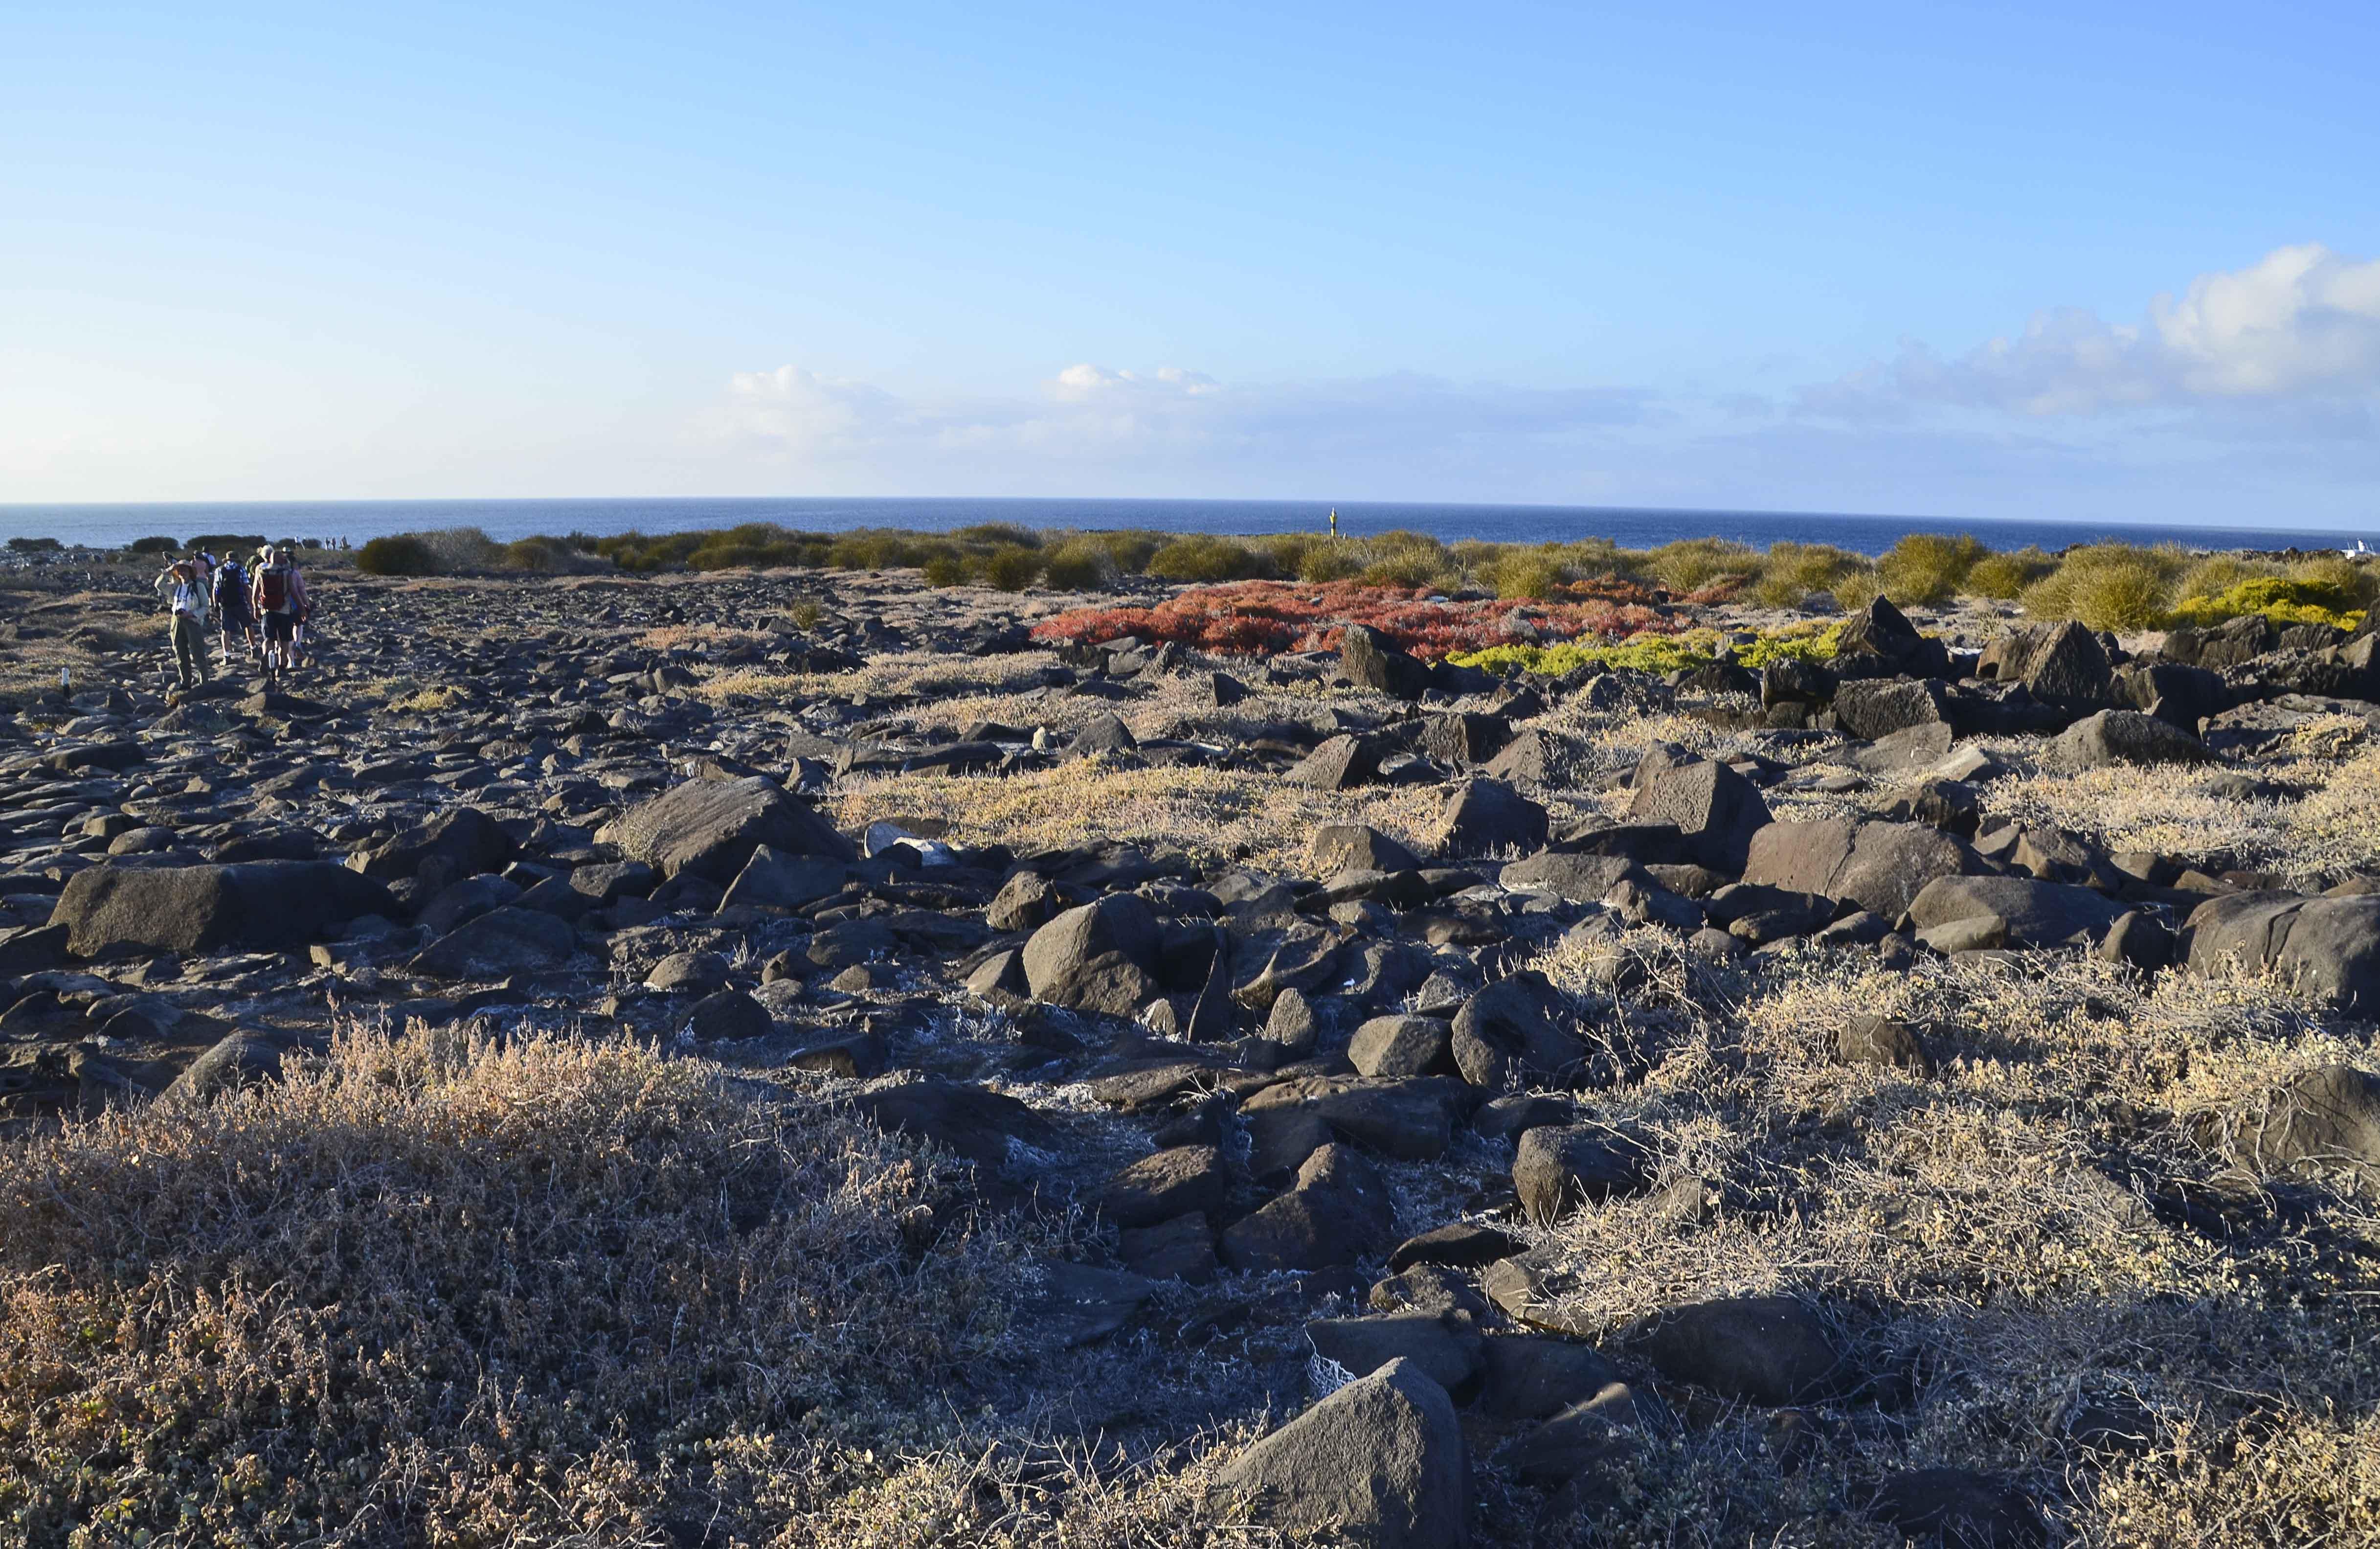 Landscapes of the Galápagos Islands – San Cristobal and Española